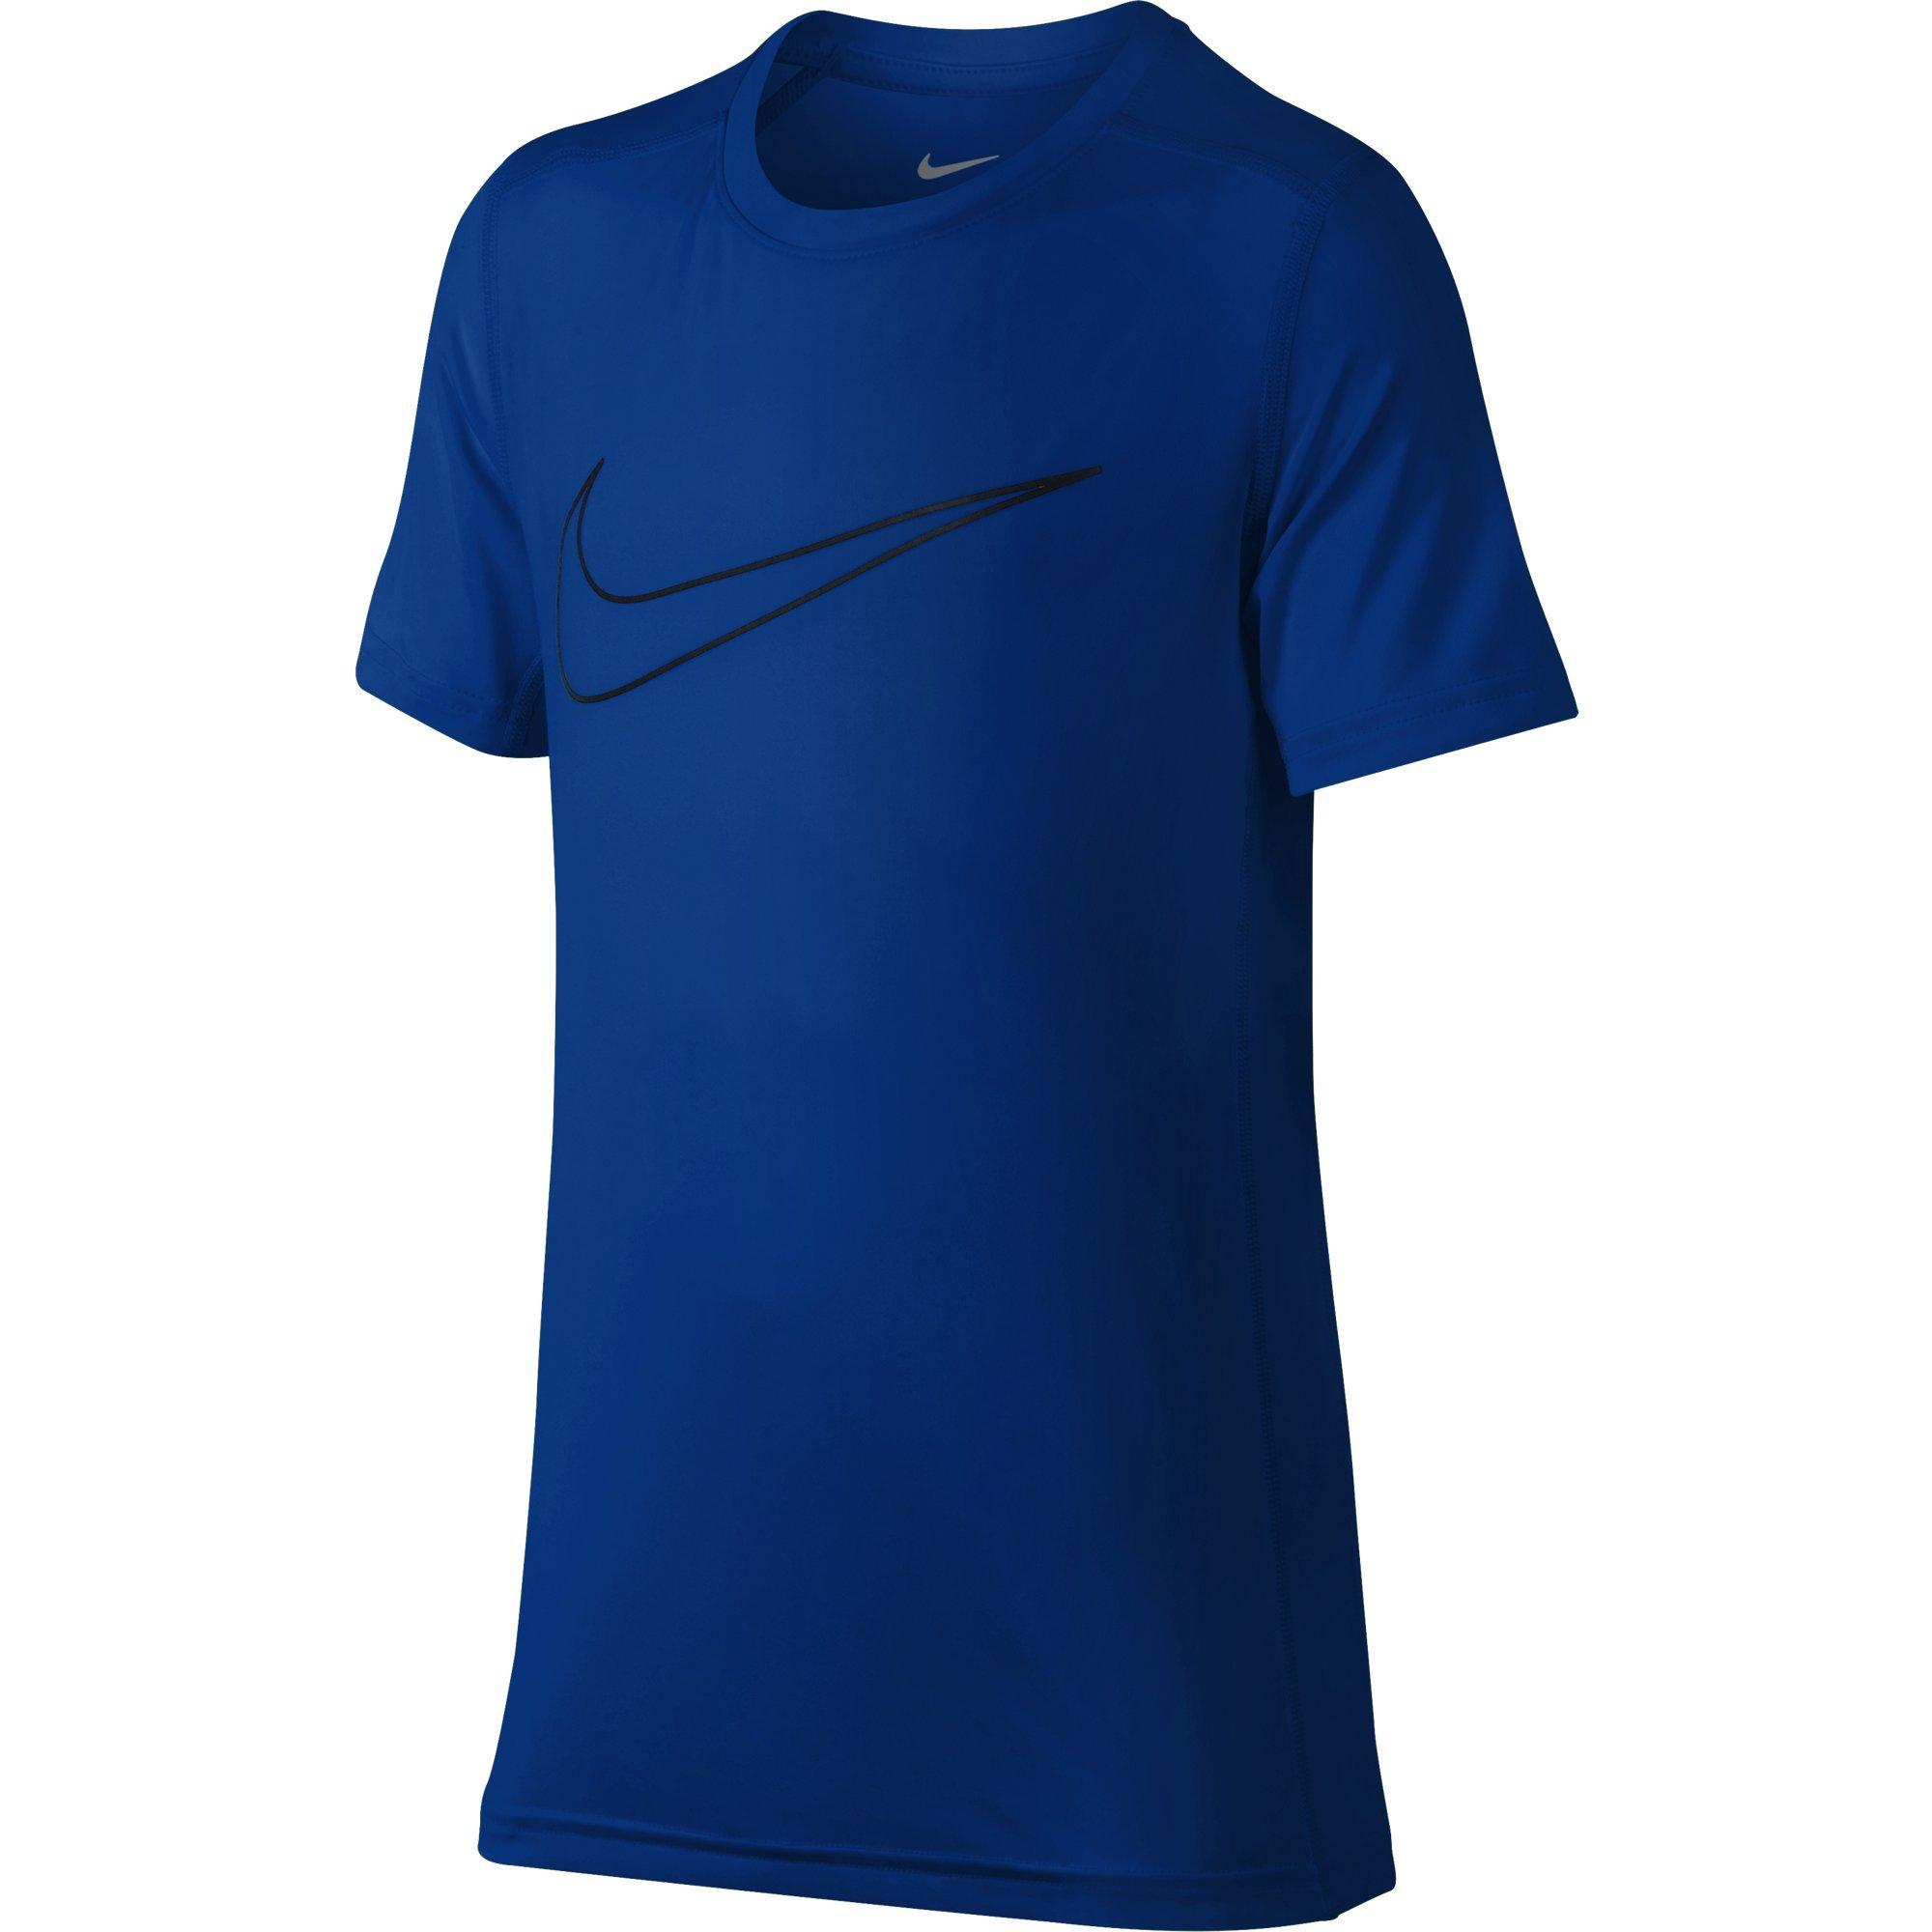 NIKE Boys' Short-Sleeve Training Shirt, Hyper Royal, Small